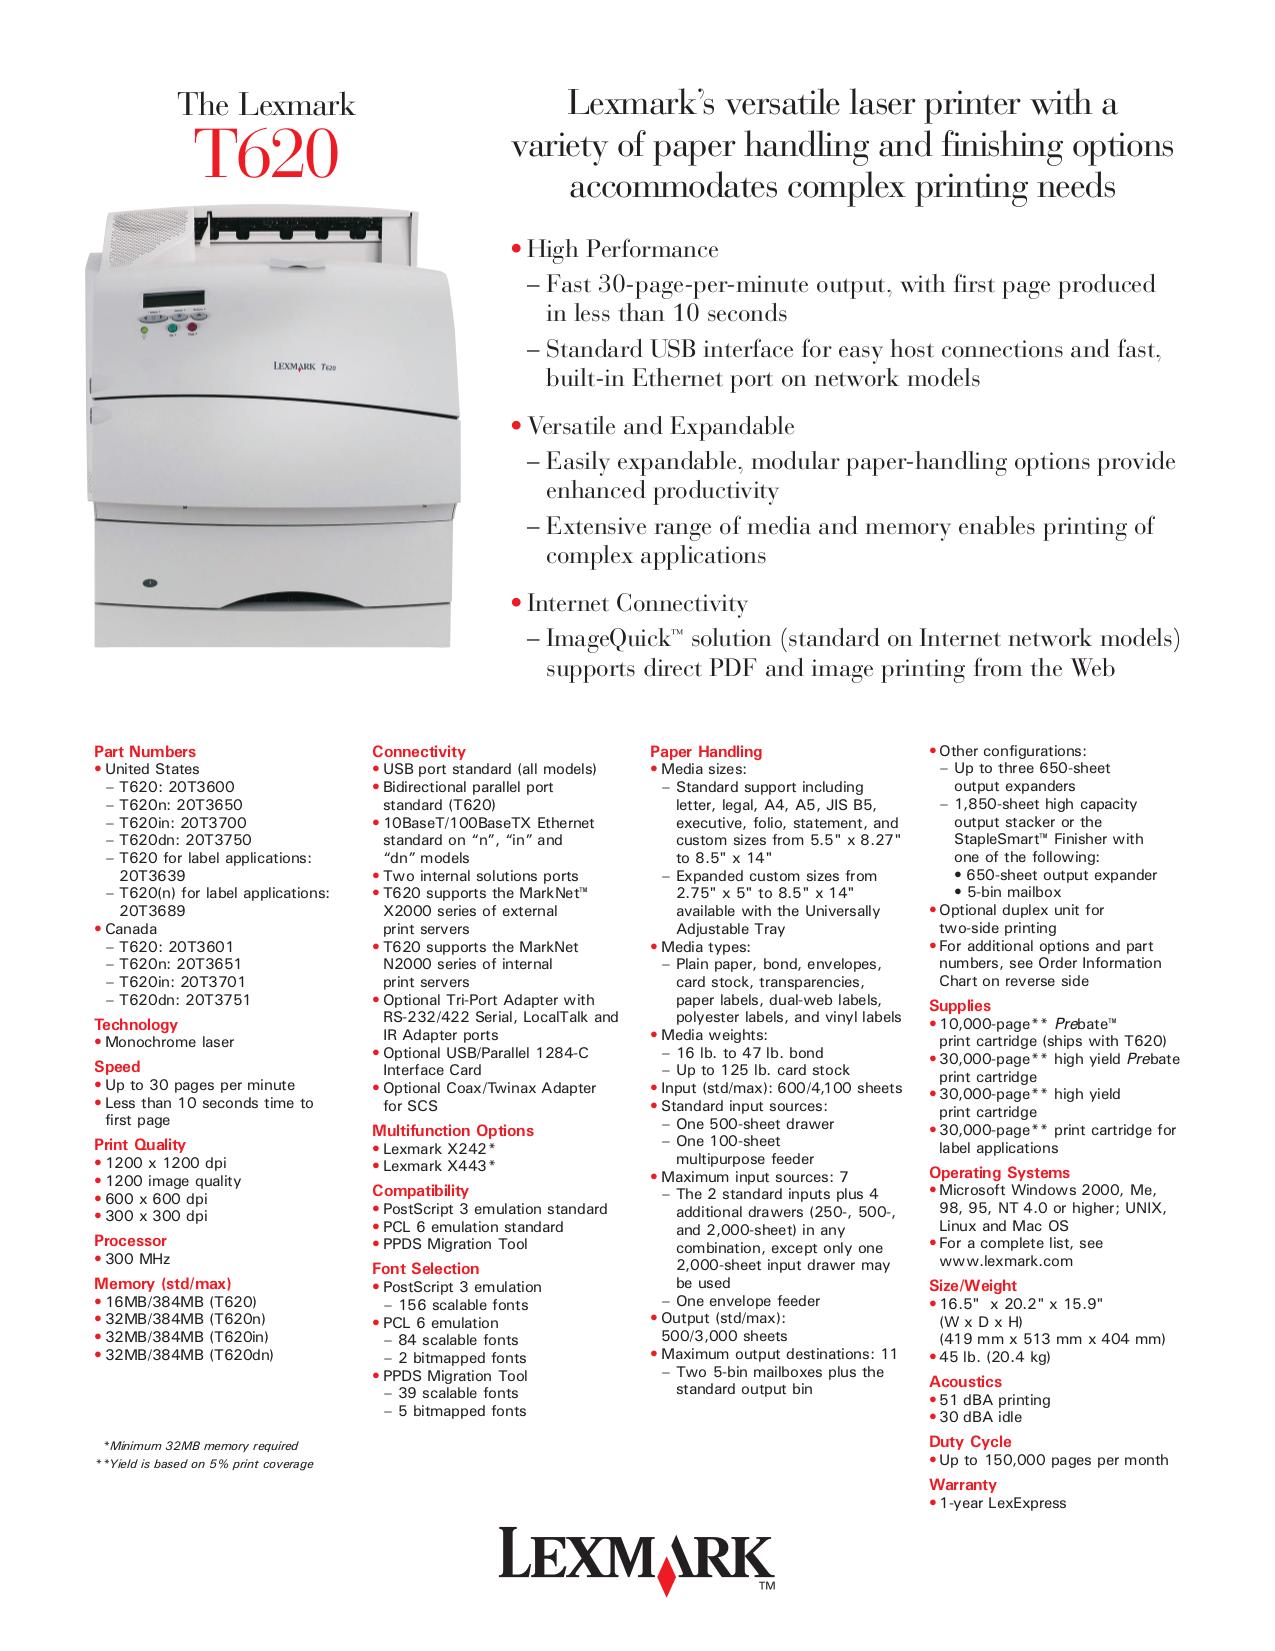 pdf for Lexmark Printer Optra T620n manual